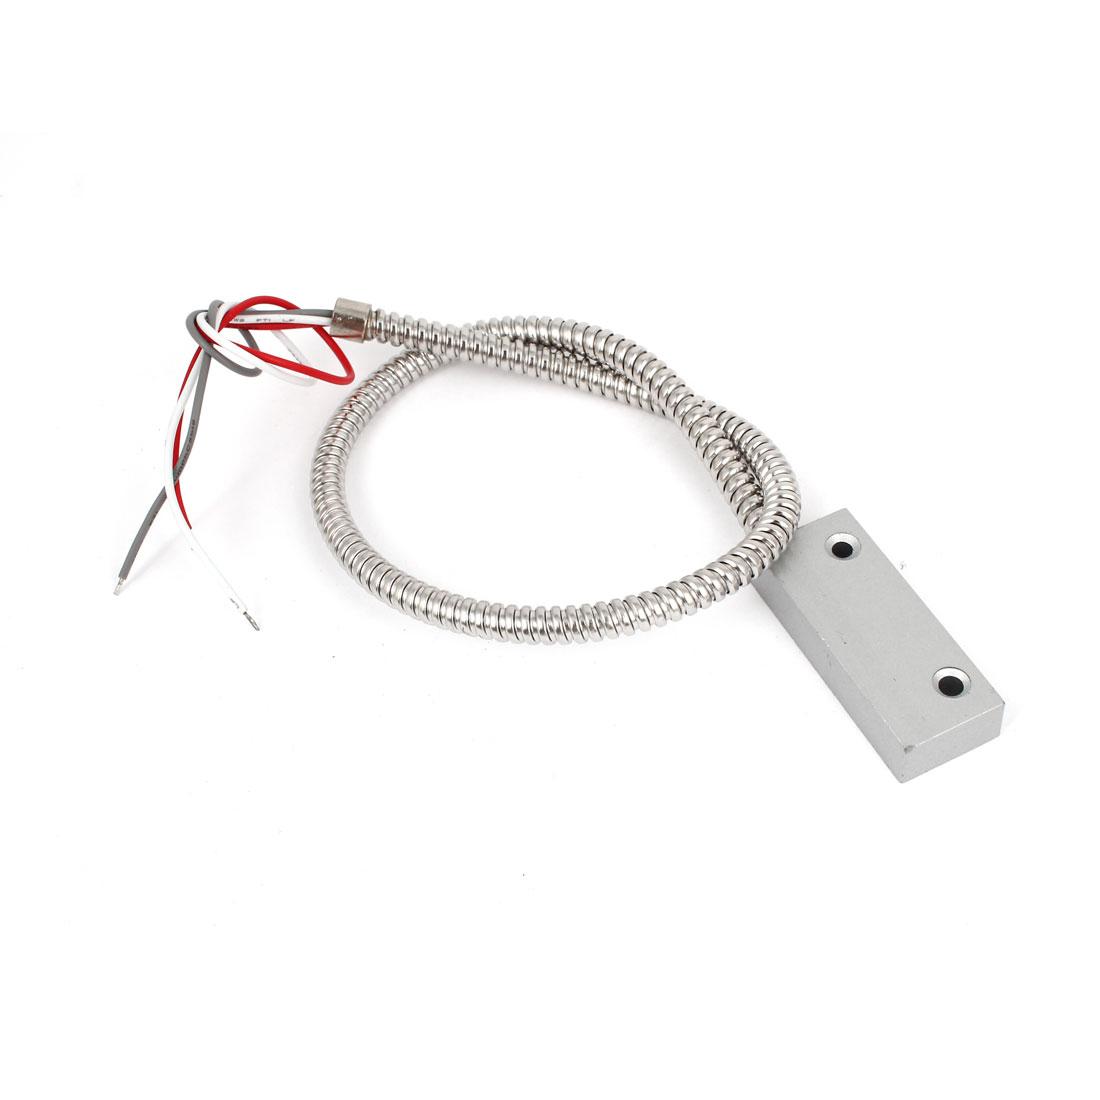 Zinc Alloy NO NC Optional Type Magnetic Window Door Contact Alarm Reed Switch